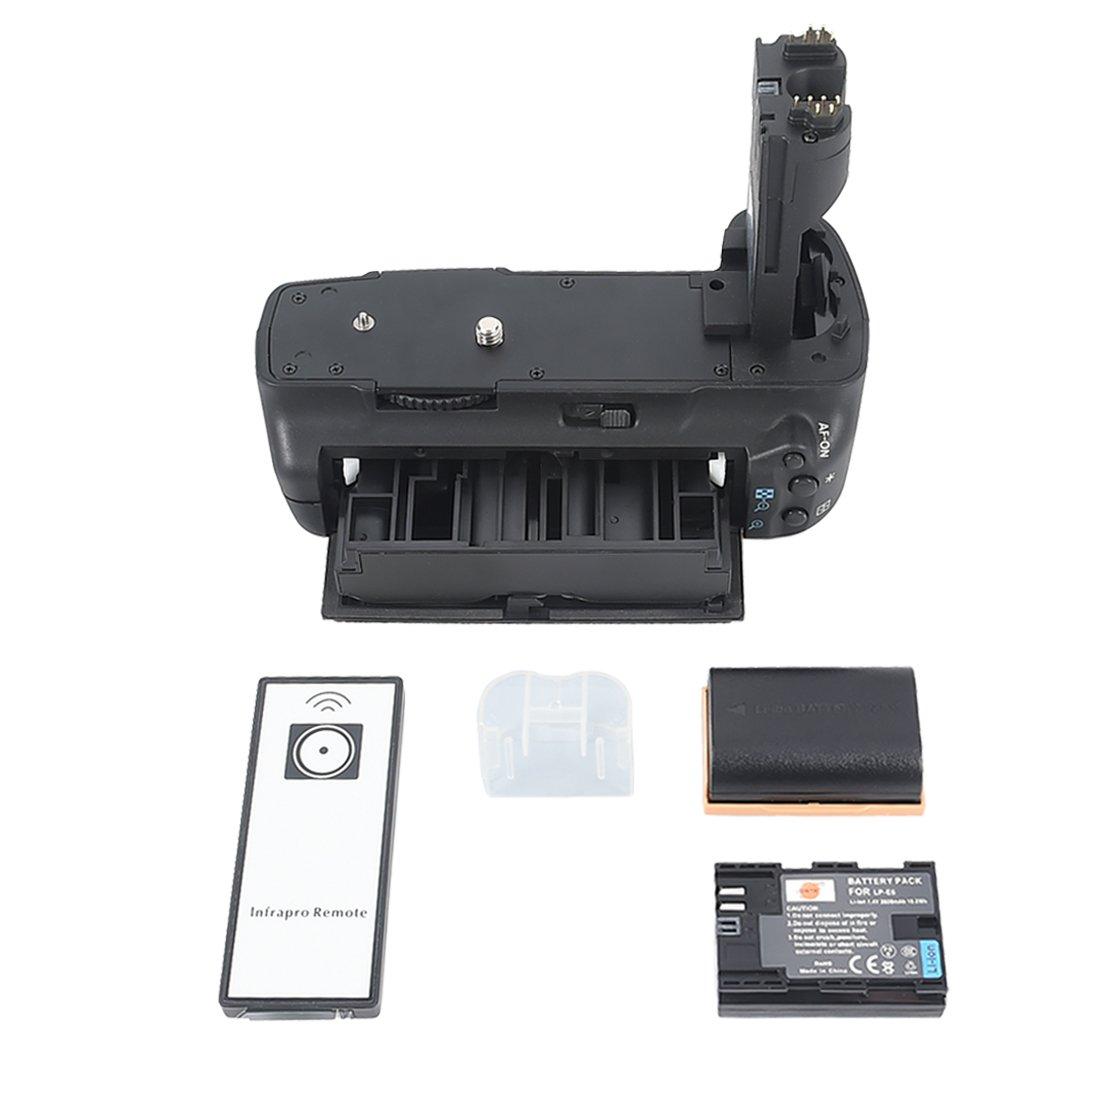 2x LP-E6 Battery for Canon EOS 5D Mark II 5D2 SLR Digital Camera DSTE/® Pro IR Remote BG-E6 Vertical Battery Grip